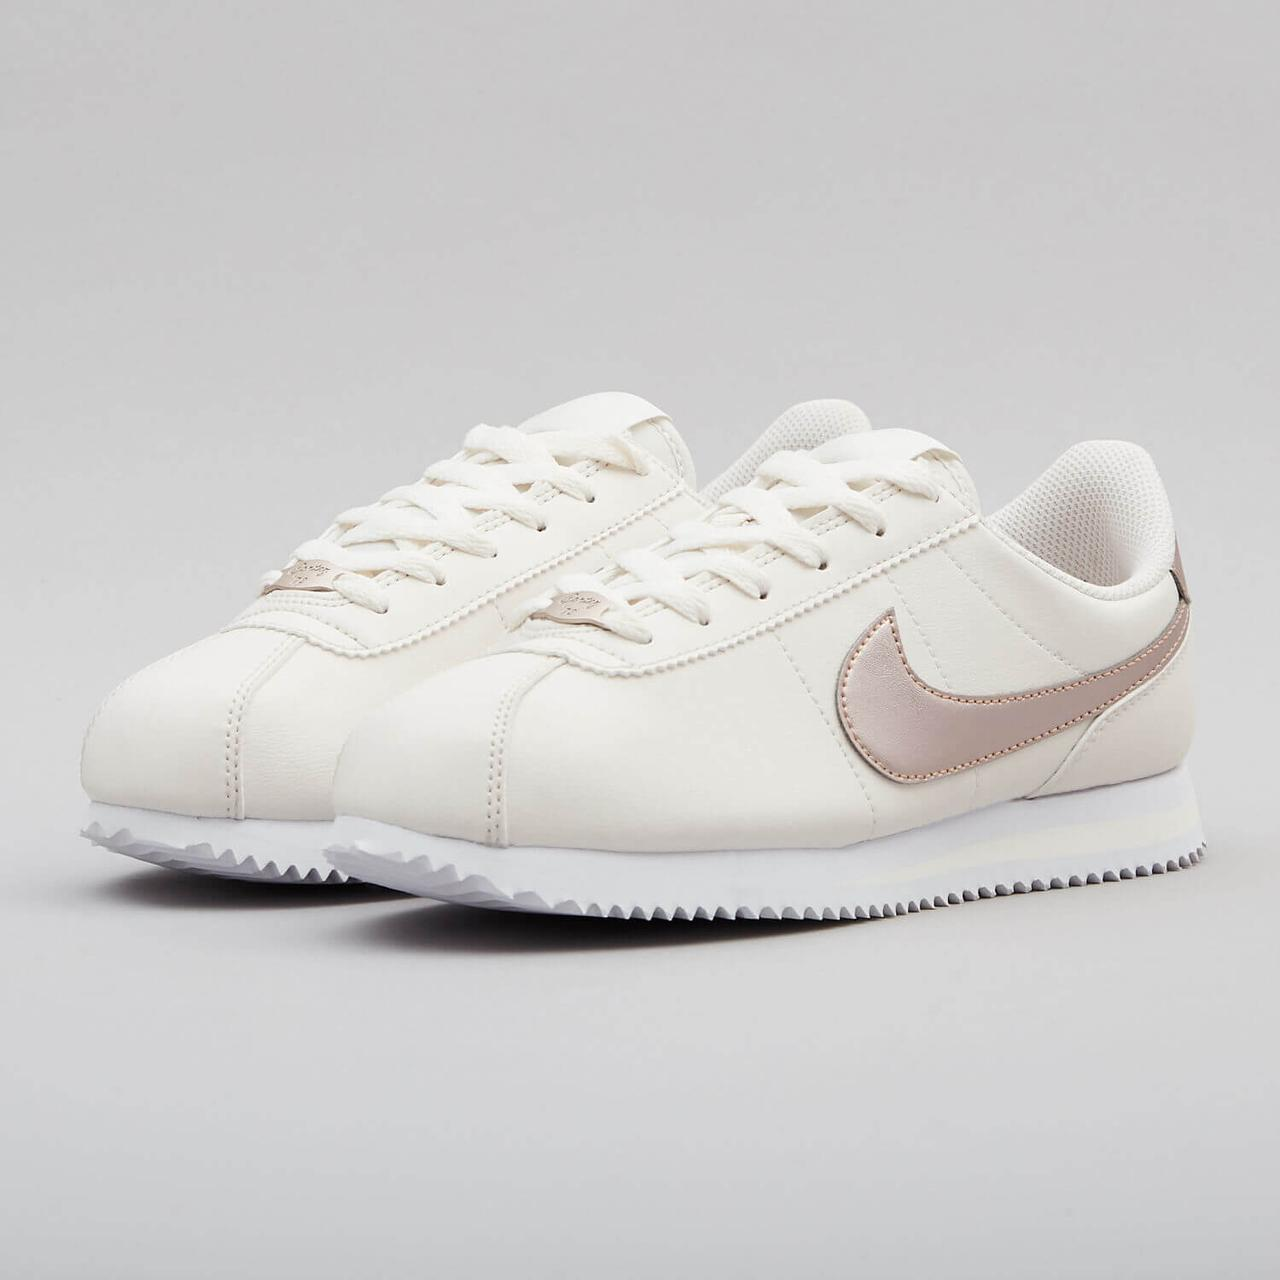 7519b833 Детские Кроссовки Nike Cortez Basic SL GS AH7528-002 (Оригинал) - Football  Mall